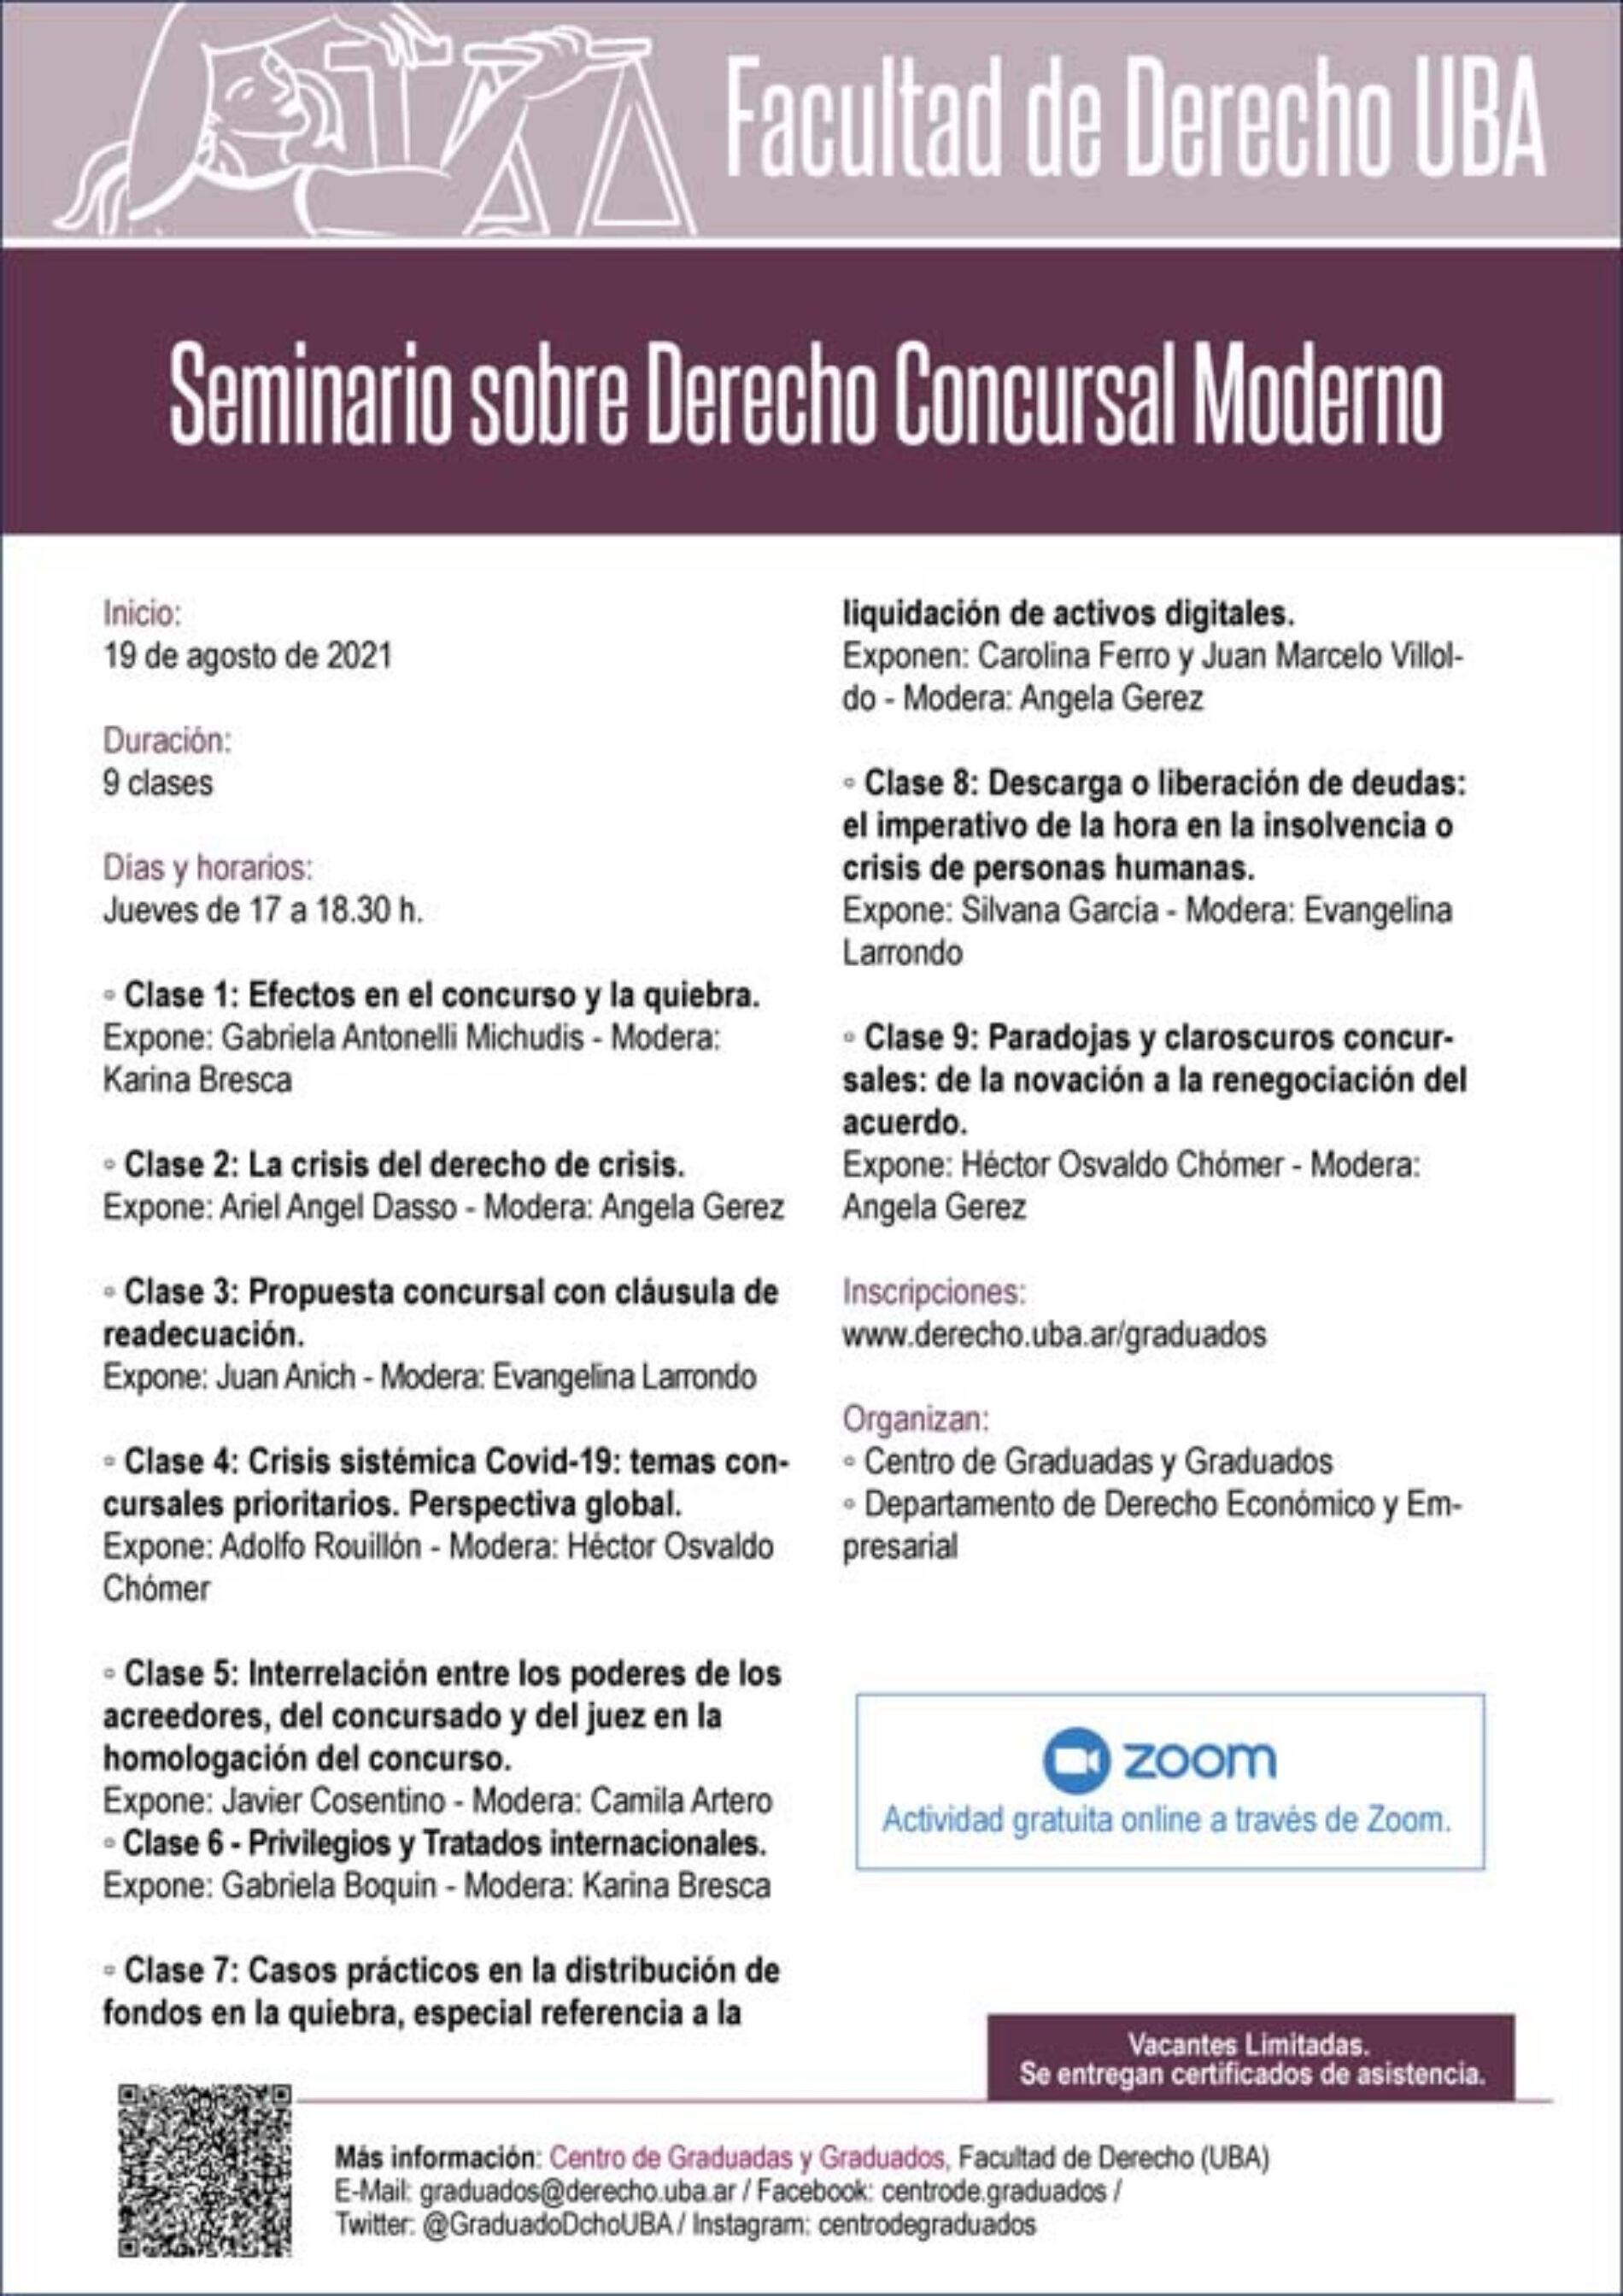 Seminario sobre Derecho Concursal Moderno – Facultad de Derecho, UBA.